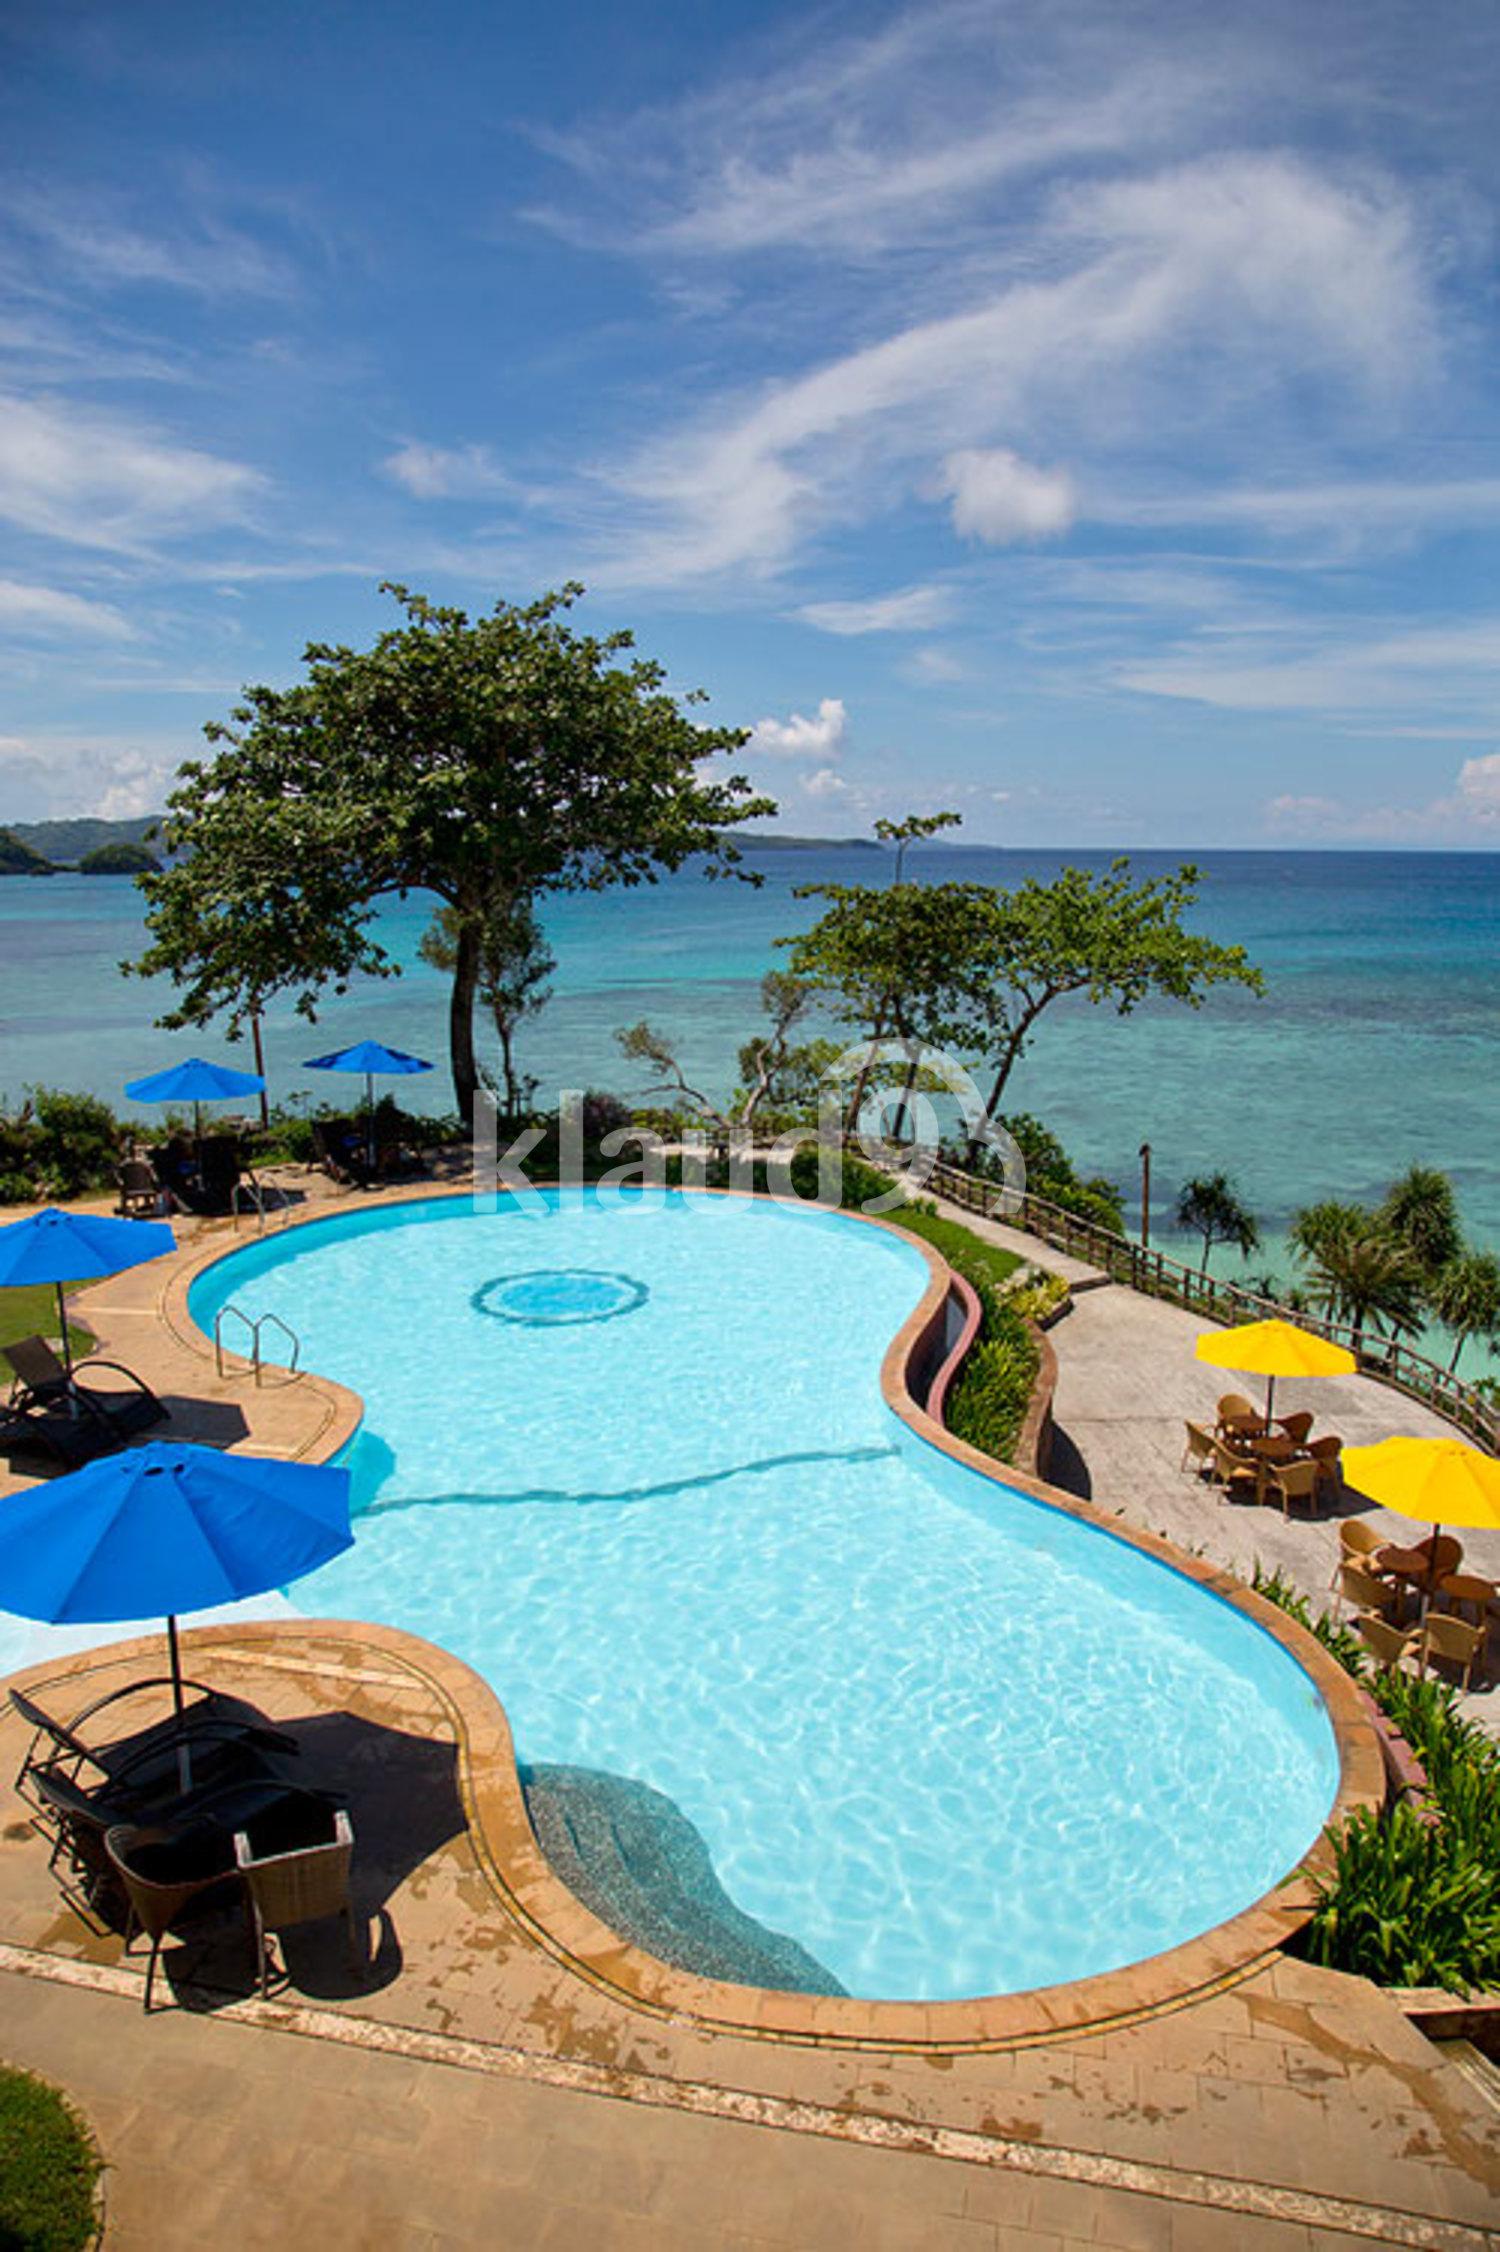 Swimming pool on Boracay island, Philippines